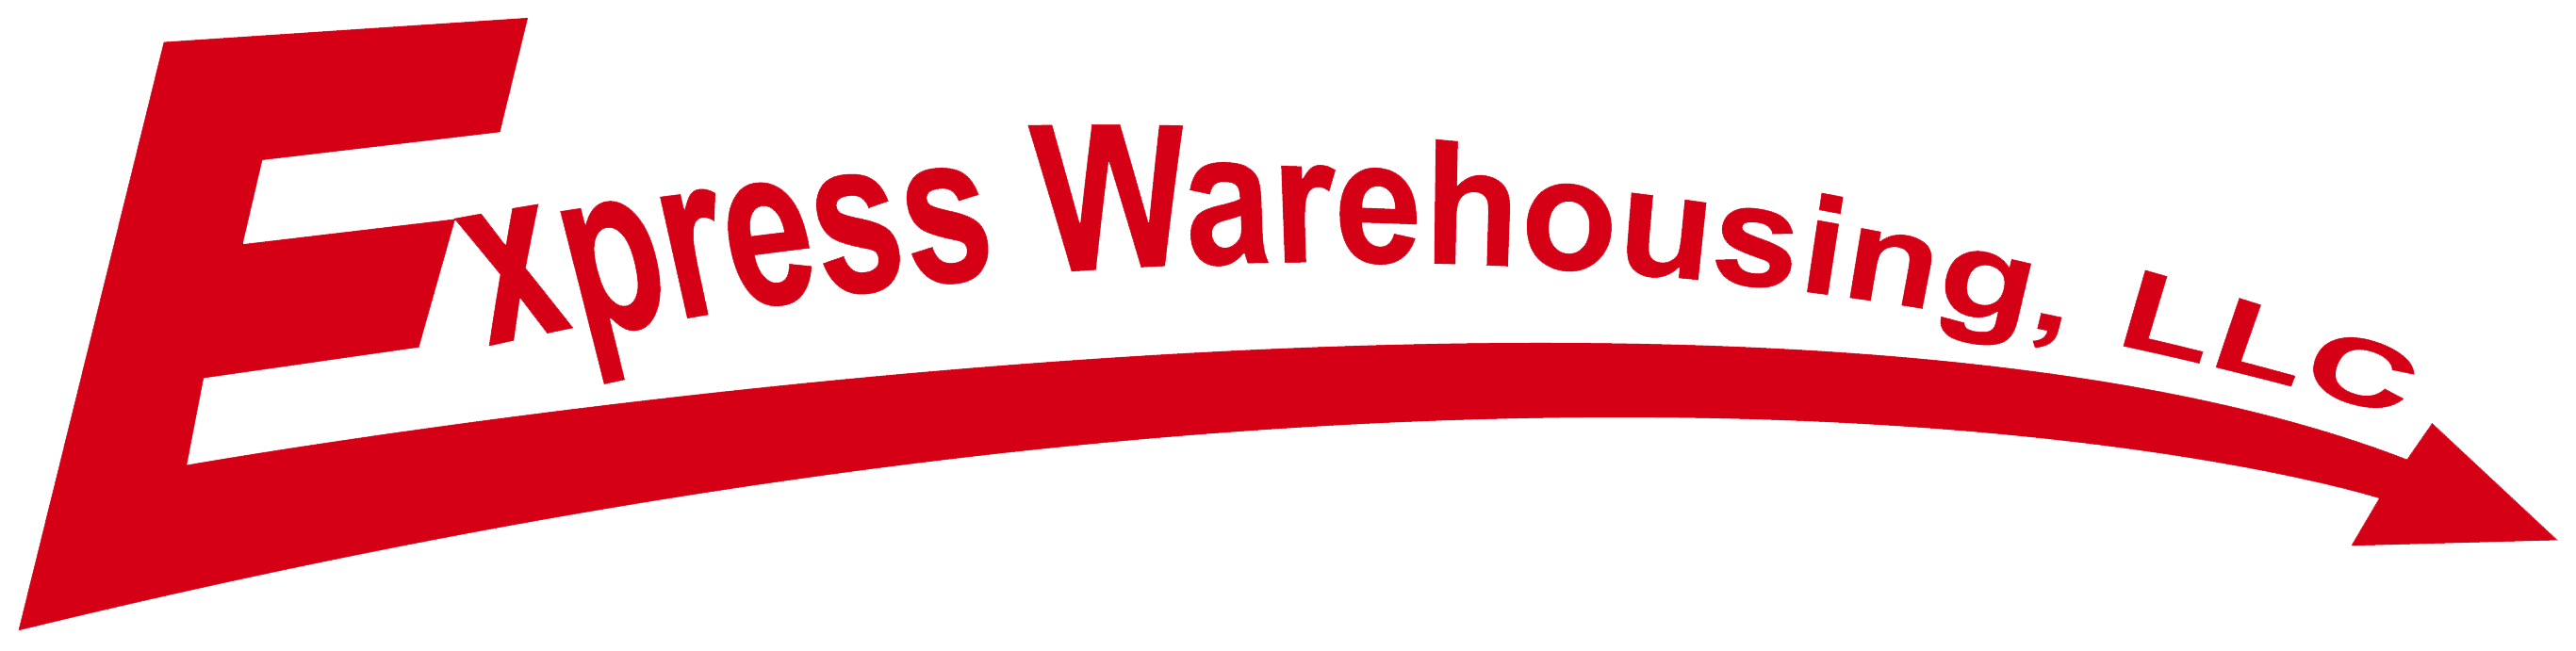 Express Warehouse Logo